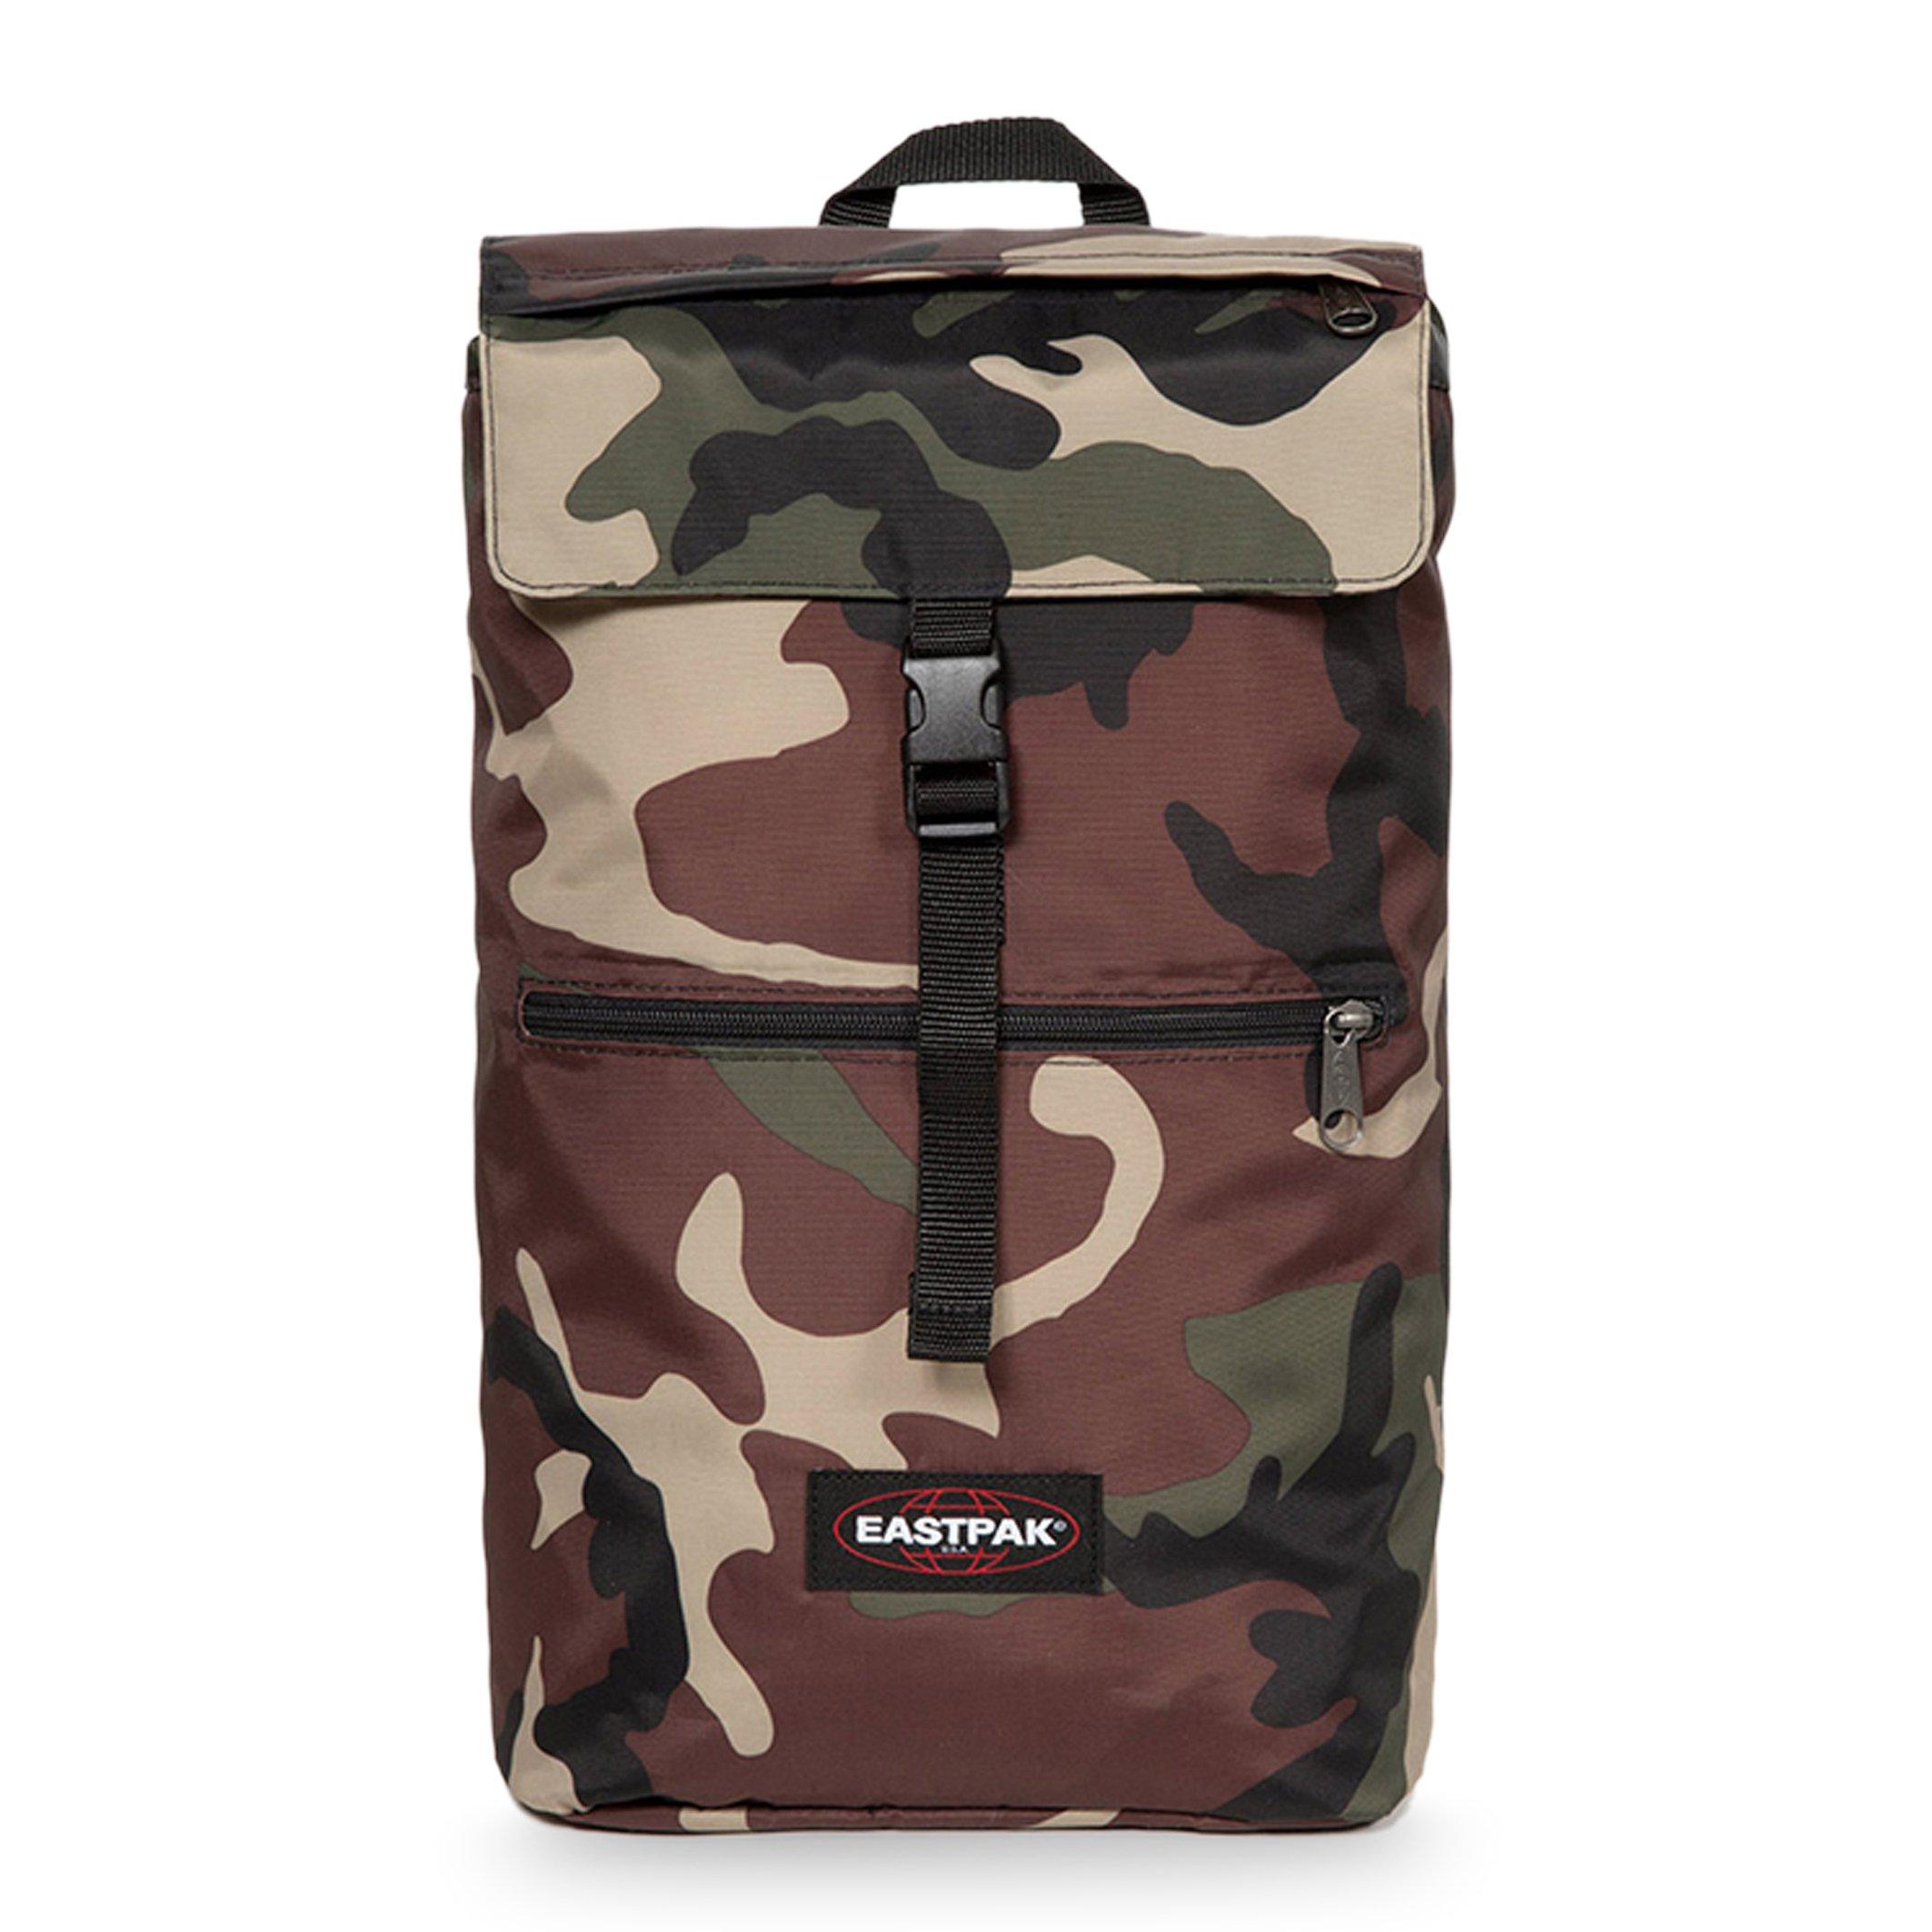 Eastpak Unsiex TOPHERINSTANT Backpack Various Colours TOPHERINSTANT_EK051E - green NOSIZE